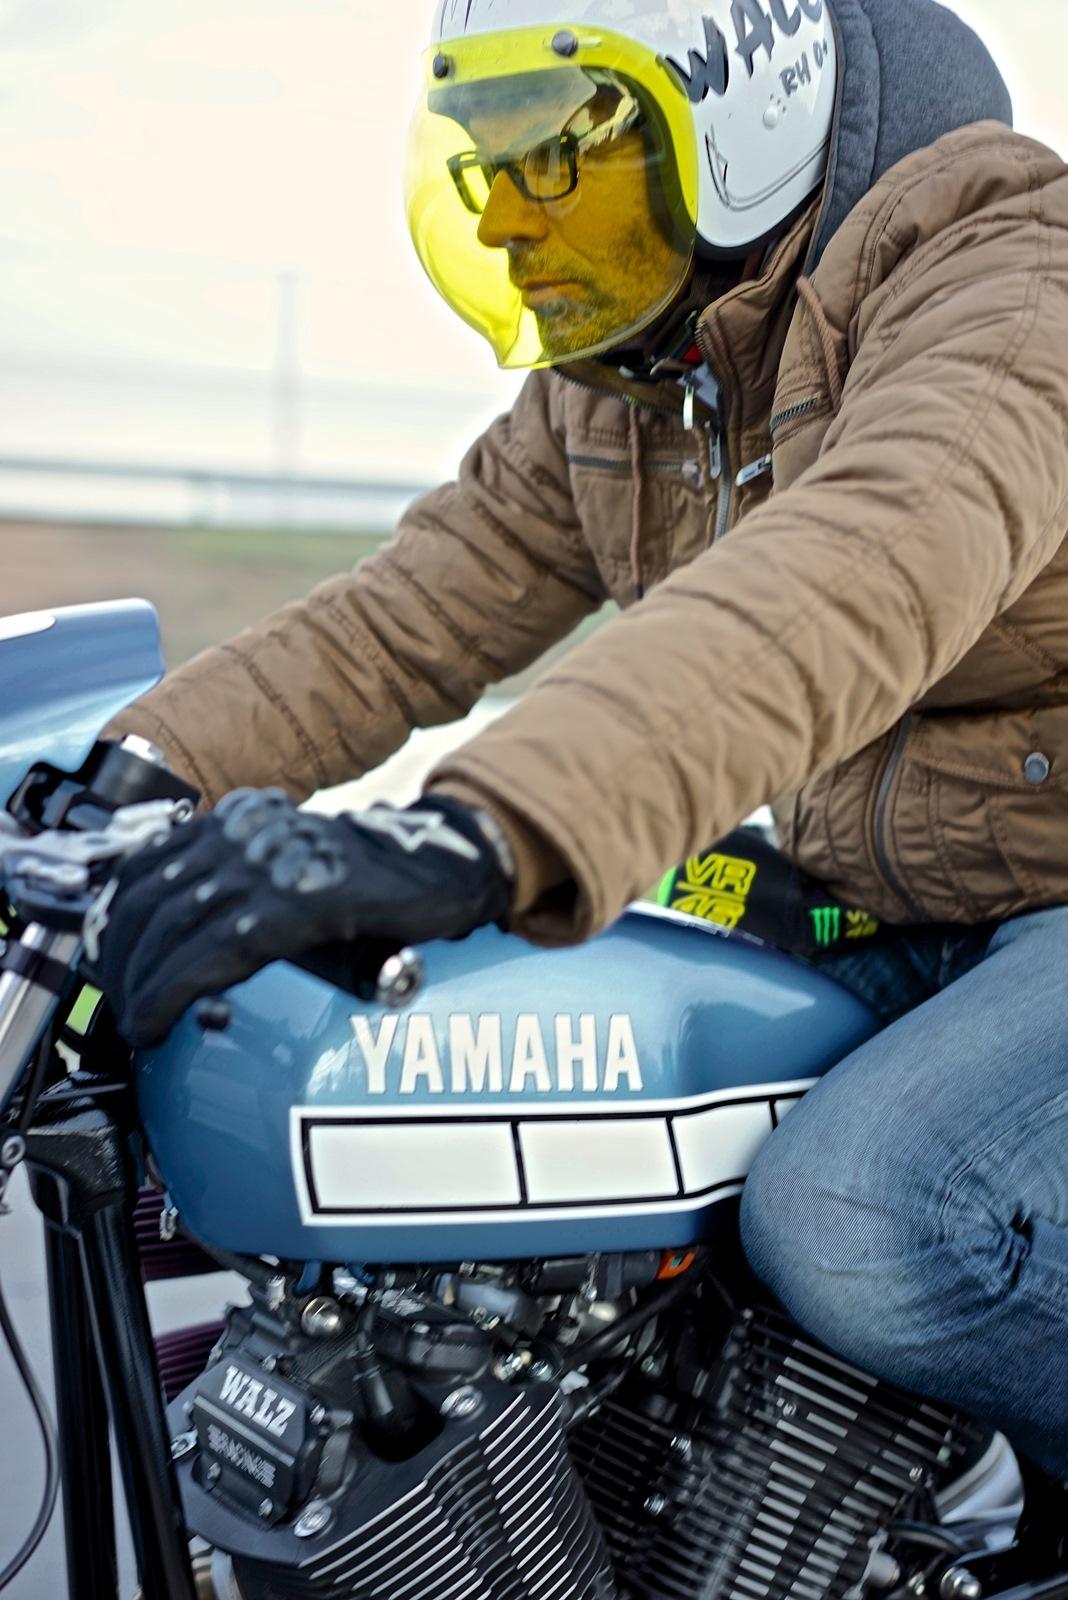 Yamaha XV950 El Ratón Asesino by Marcus Walz